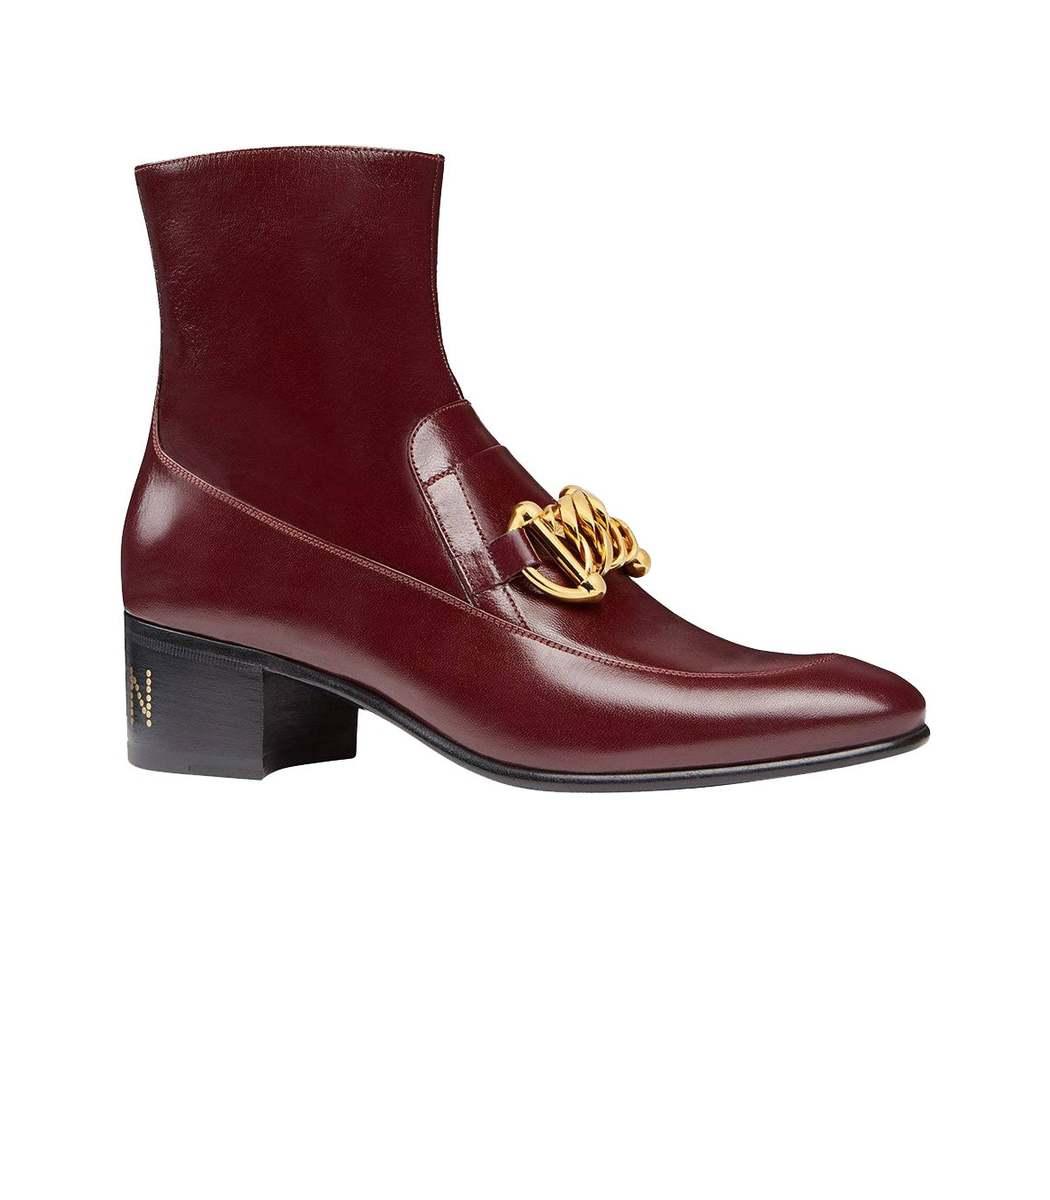 Gucci Boots Horsebit Chain Boot